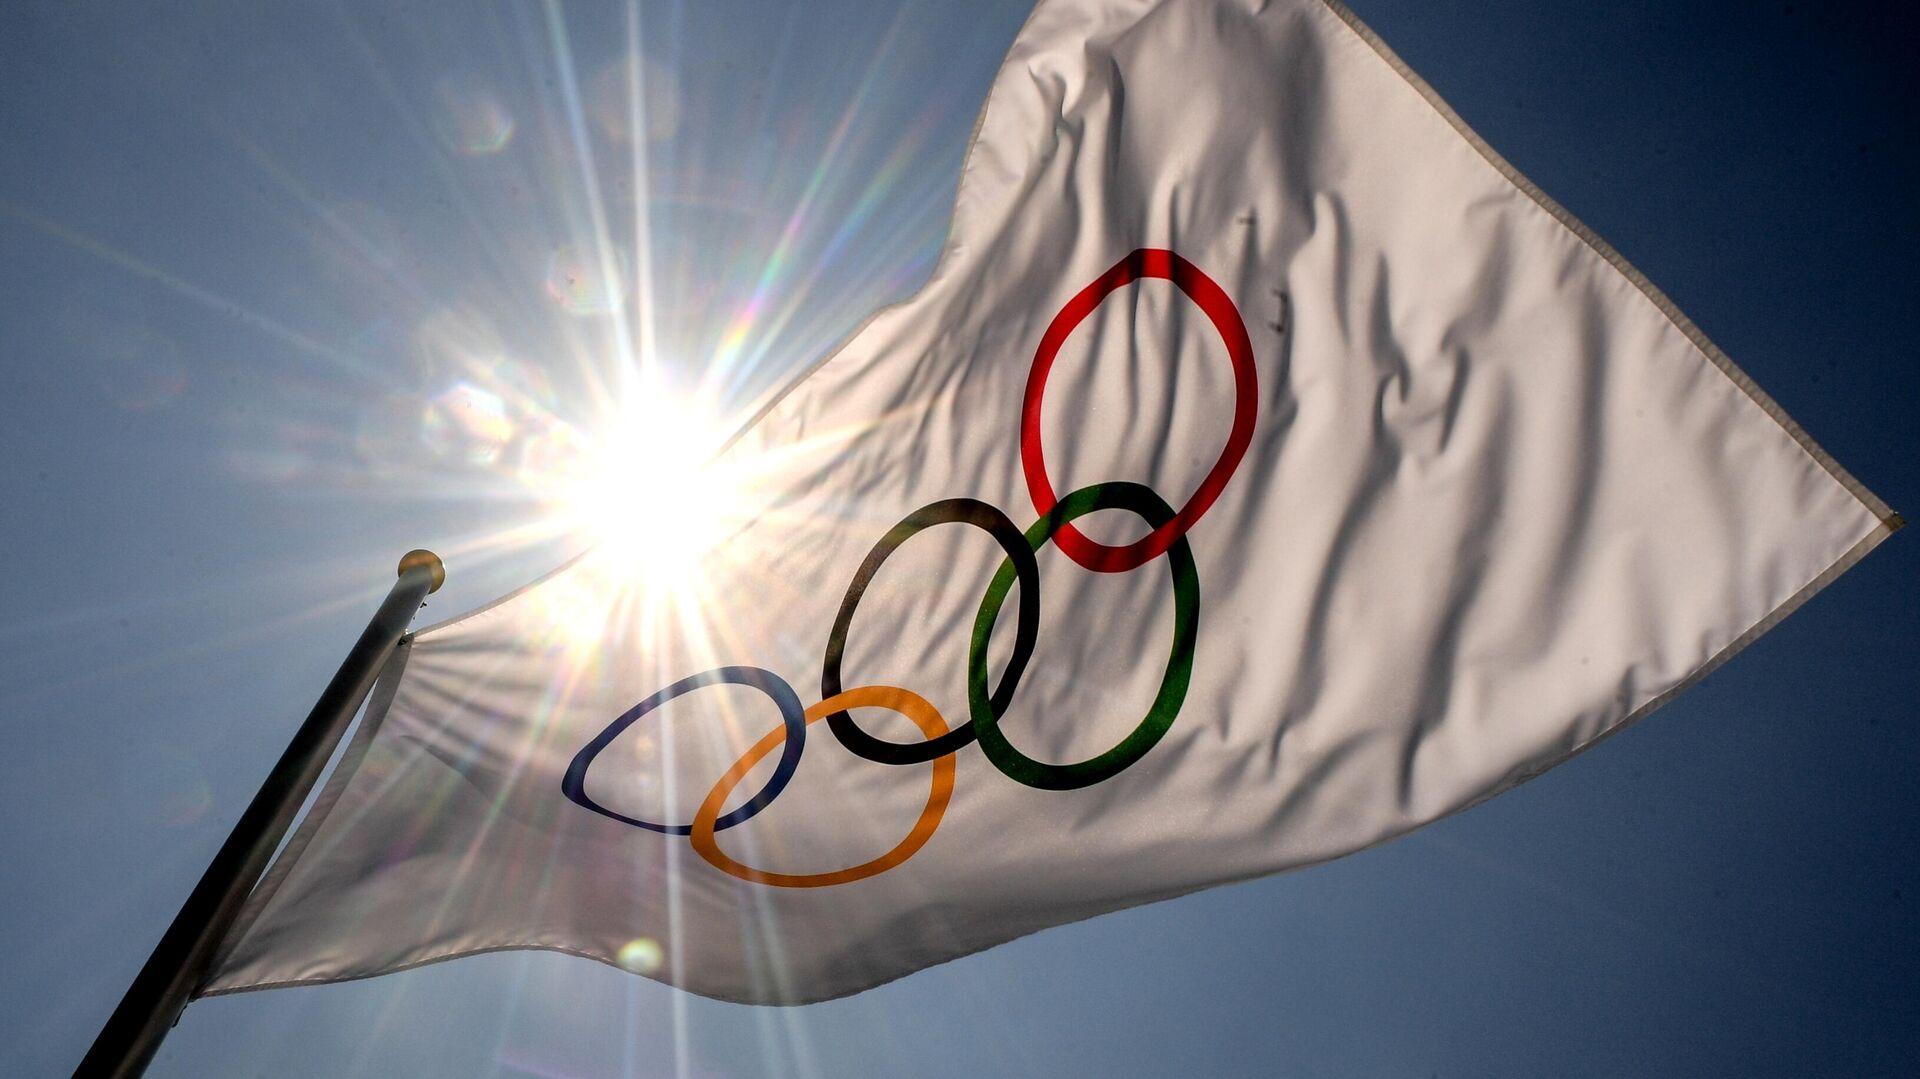 Флаг с символикой Олимпийских игр в Токио - РИА Новости, 1920, 23.07.2021